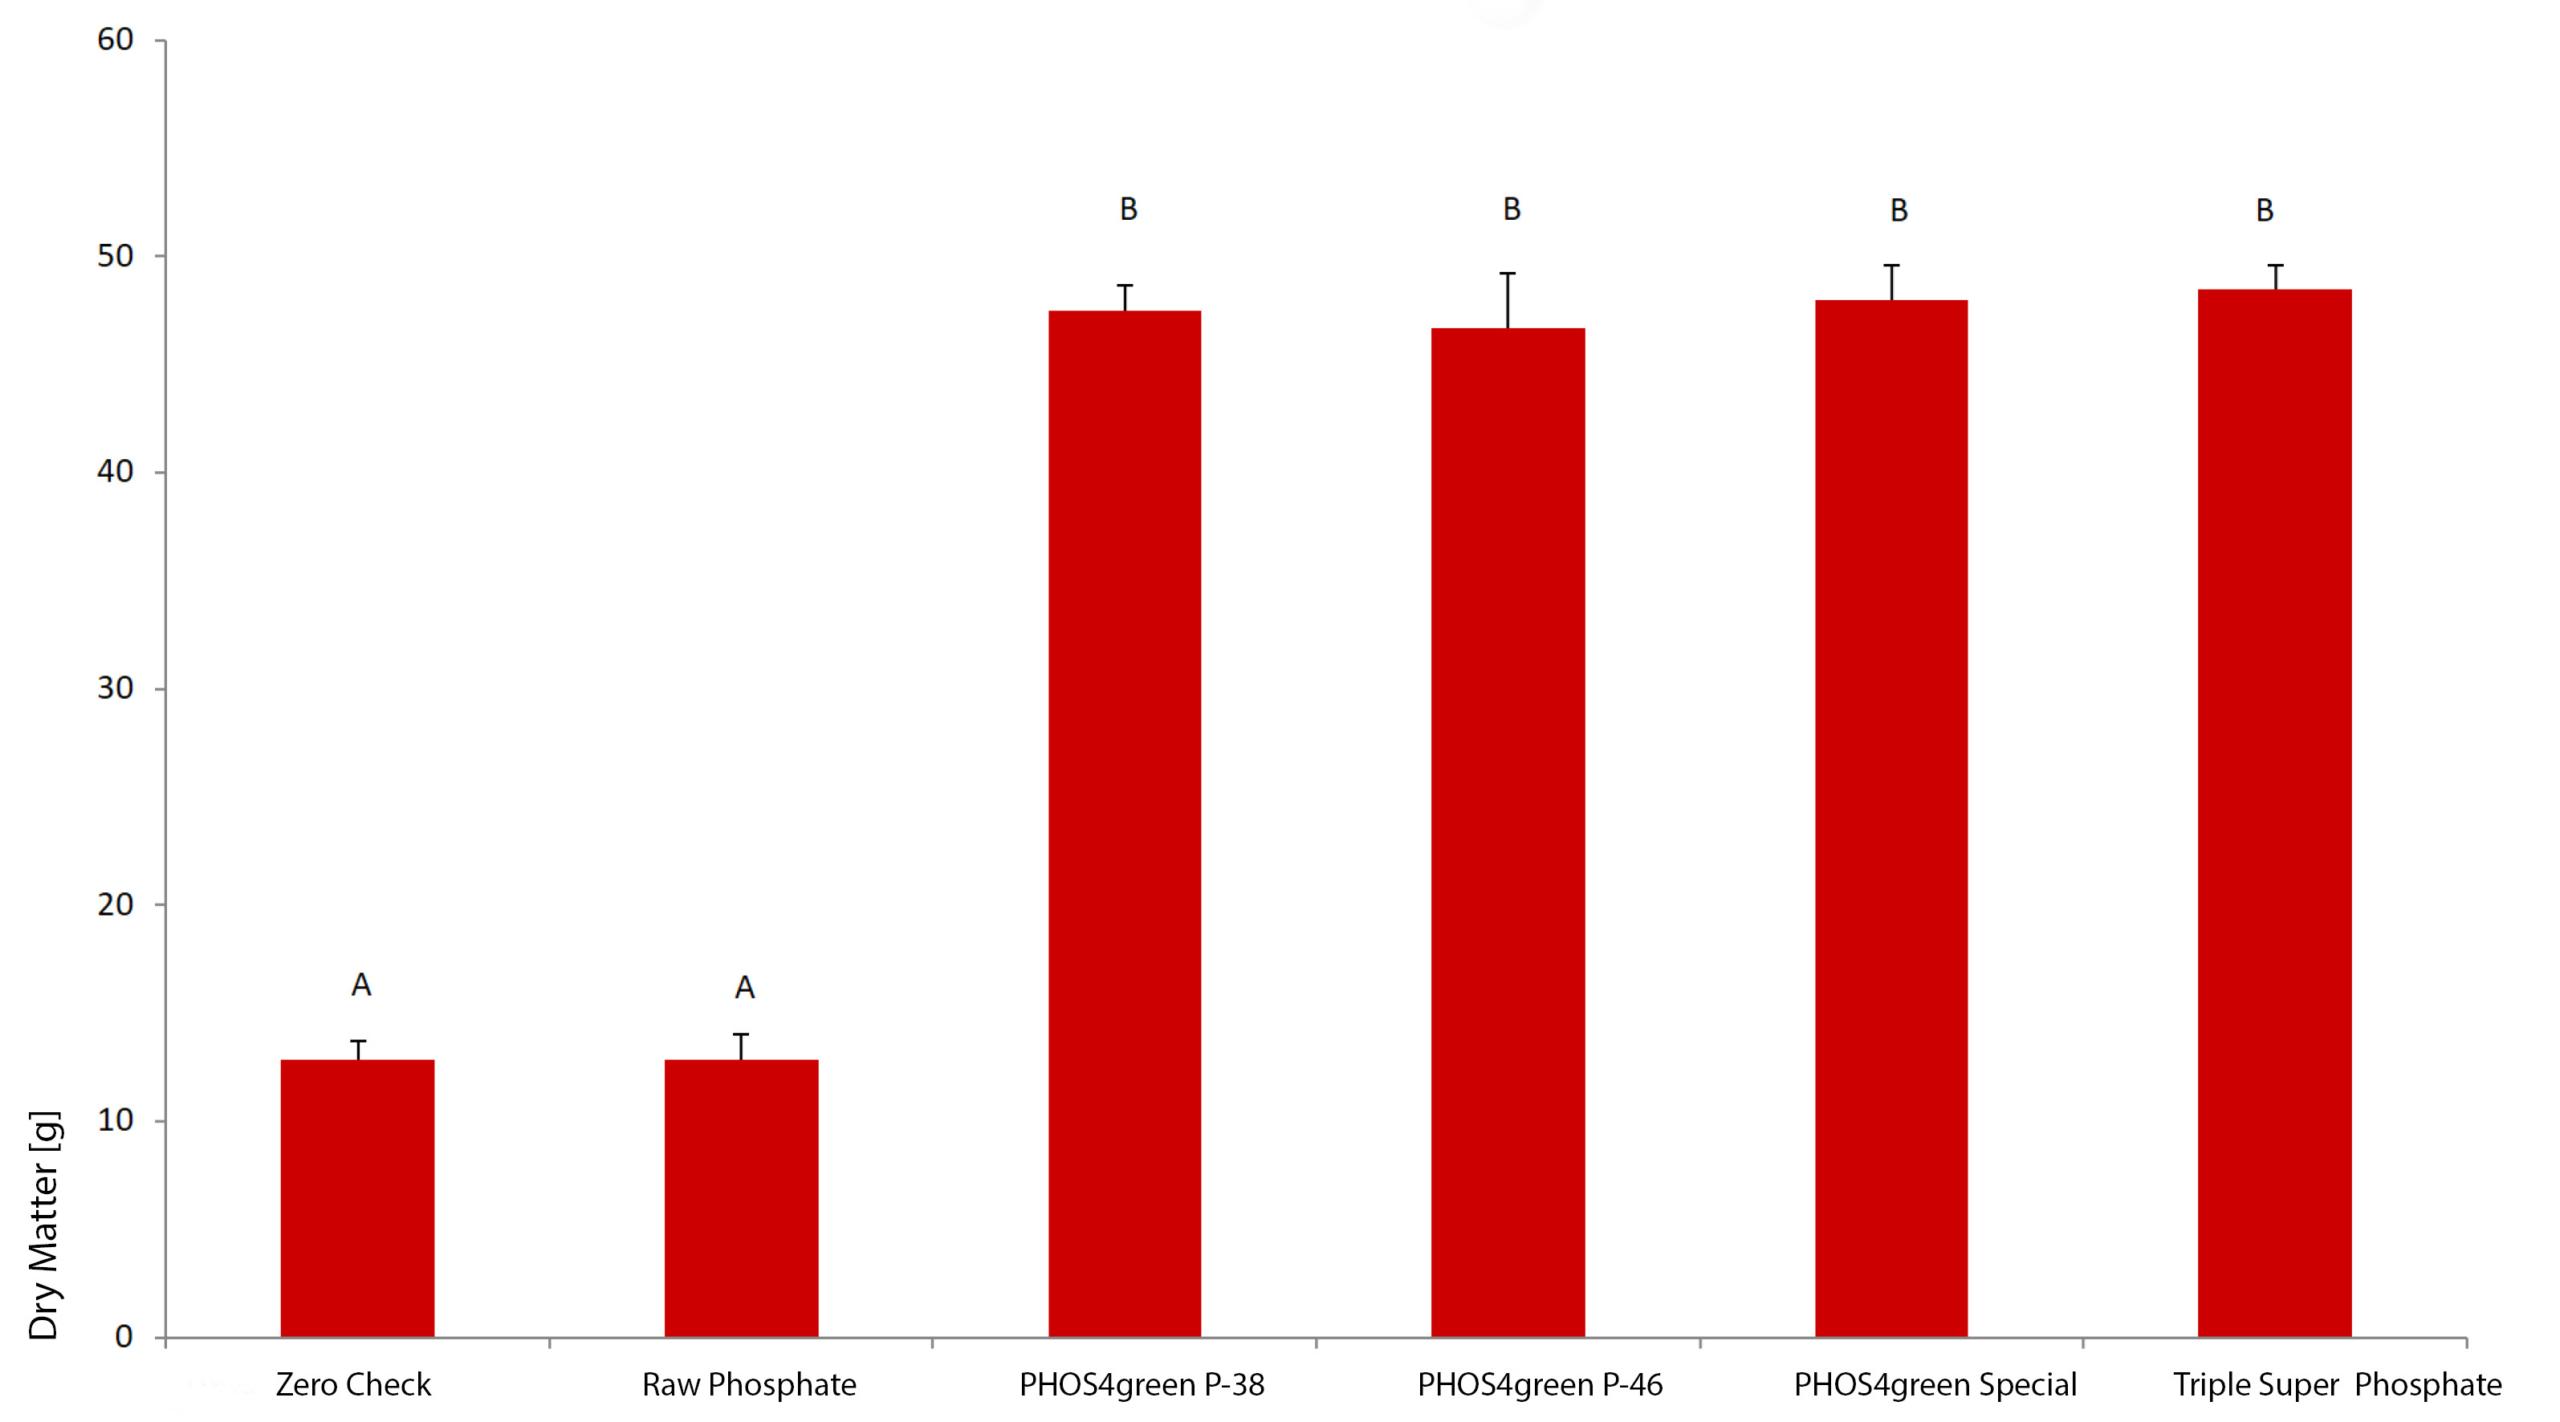 Glatt_PHOS4green_Planting-Trials_Diagramm_Dry-Mass_Ryegrass_Lollium